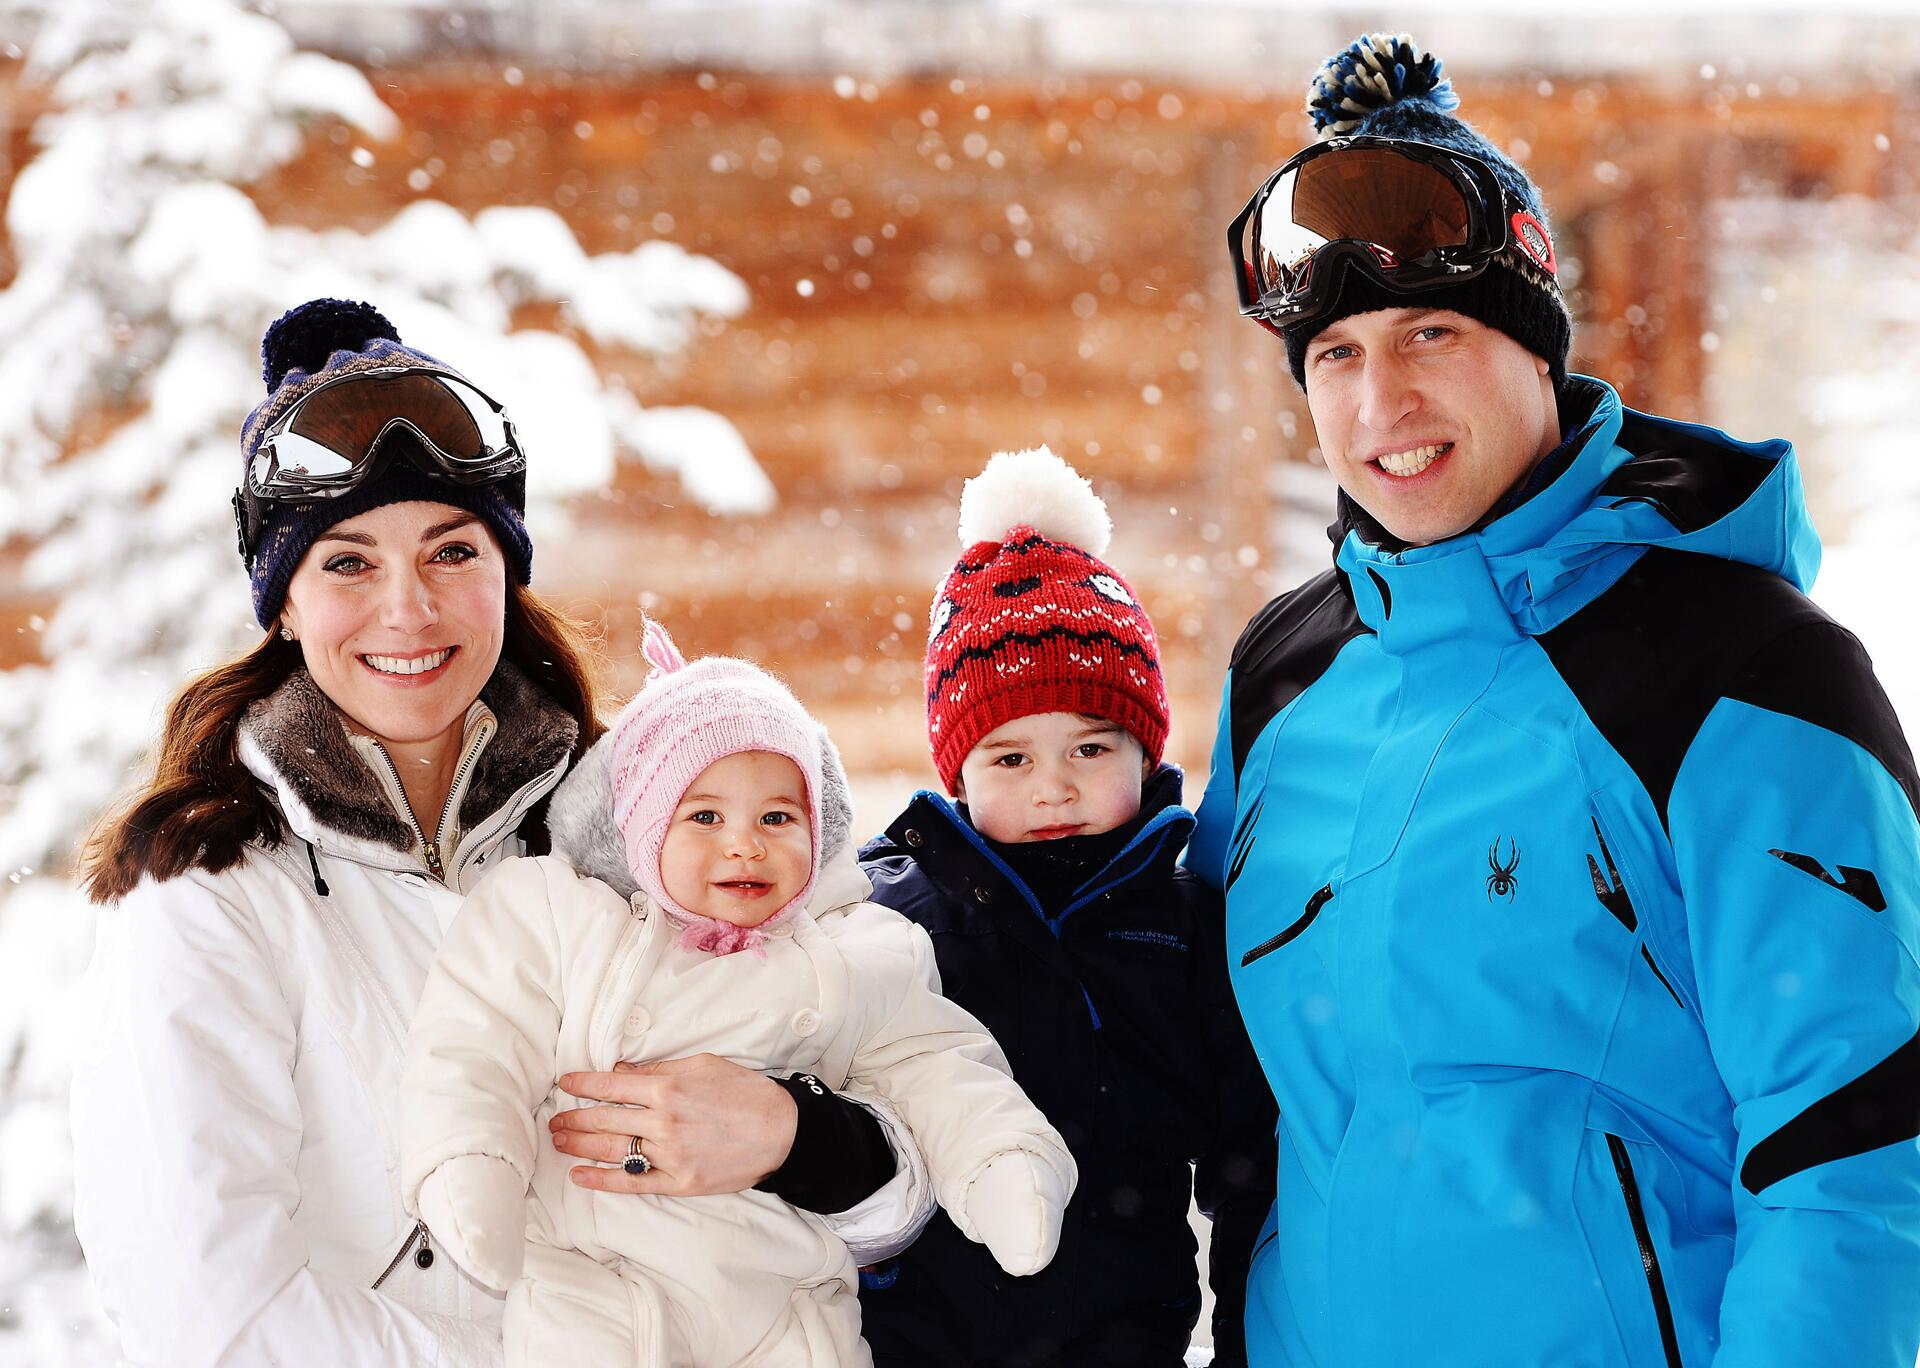 Bild zu Herzogin Kate, Prinzessin Charlotte, Prinz George, Prinz William